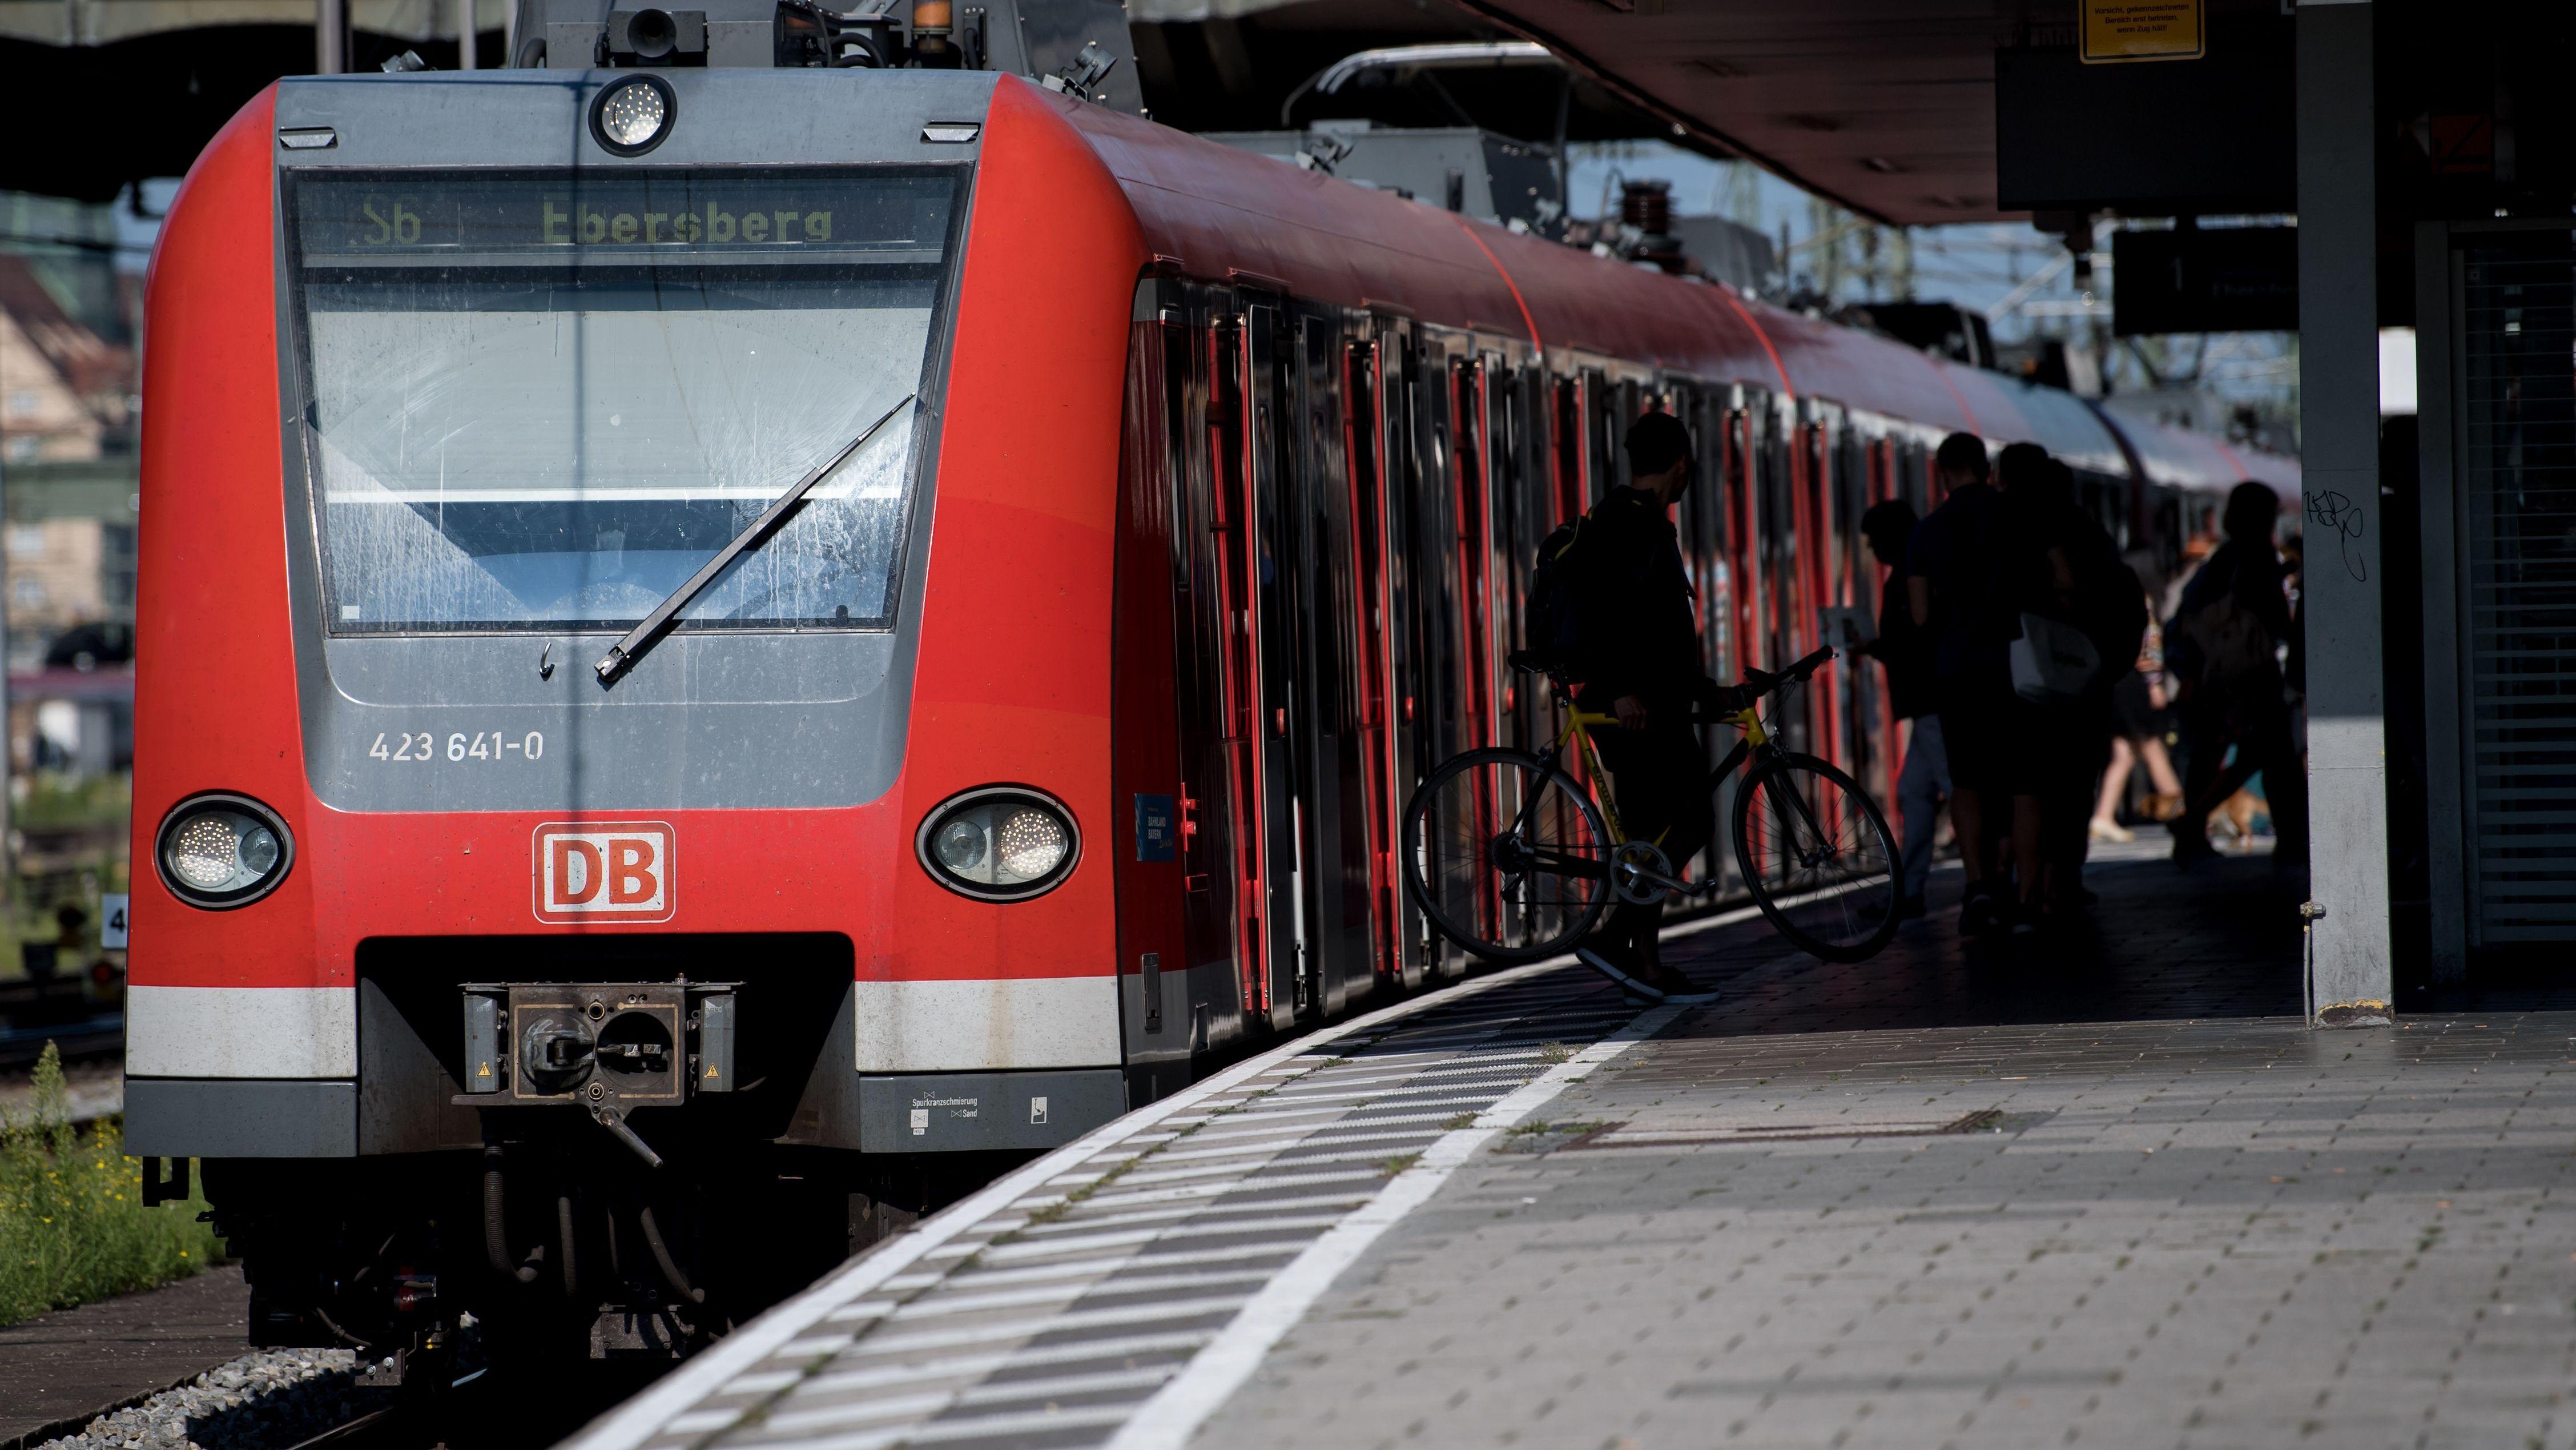 S-Bahn Richtung Ebersberg (Archivbild).